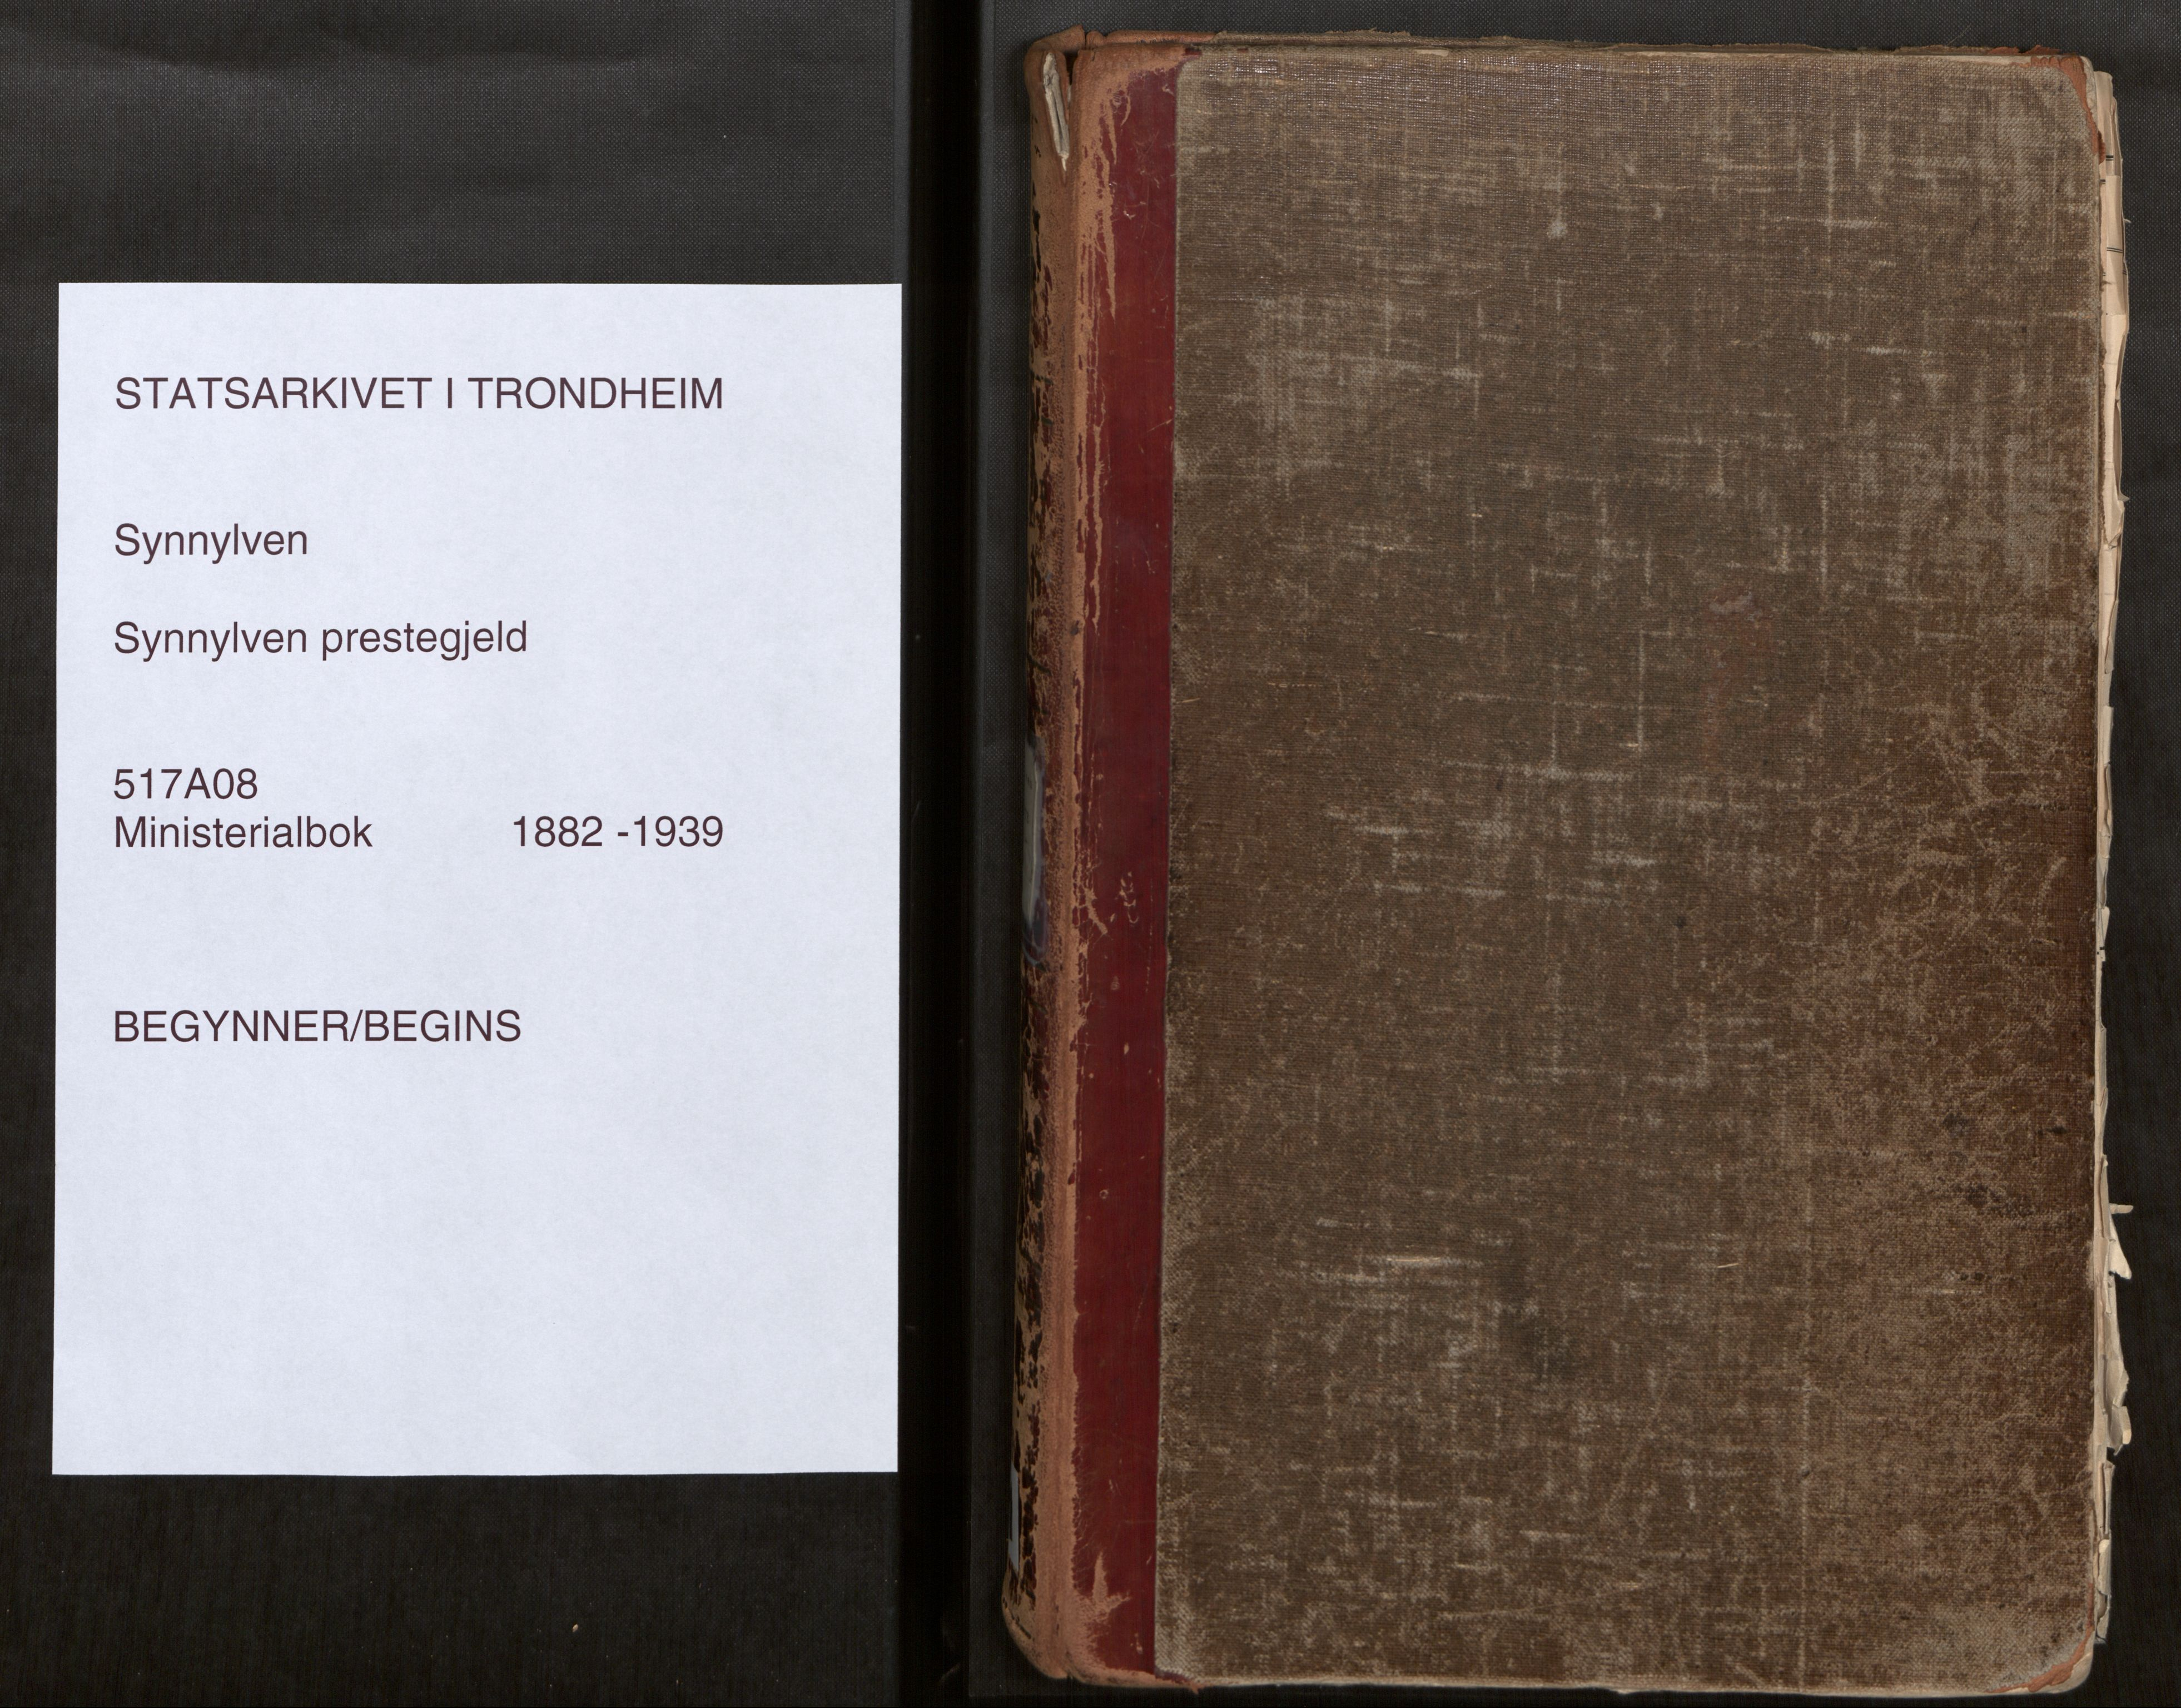 SAT, Sunnylven sokneprestkontor, Ministerialbok nr. 517A08, 1882-1939